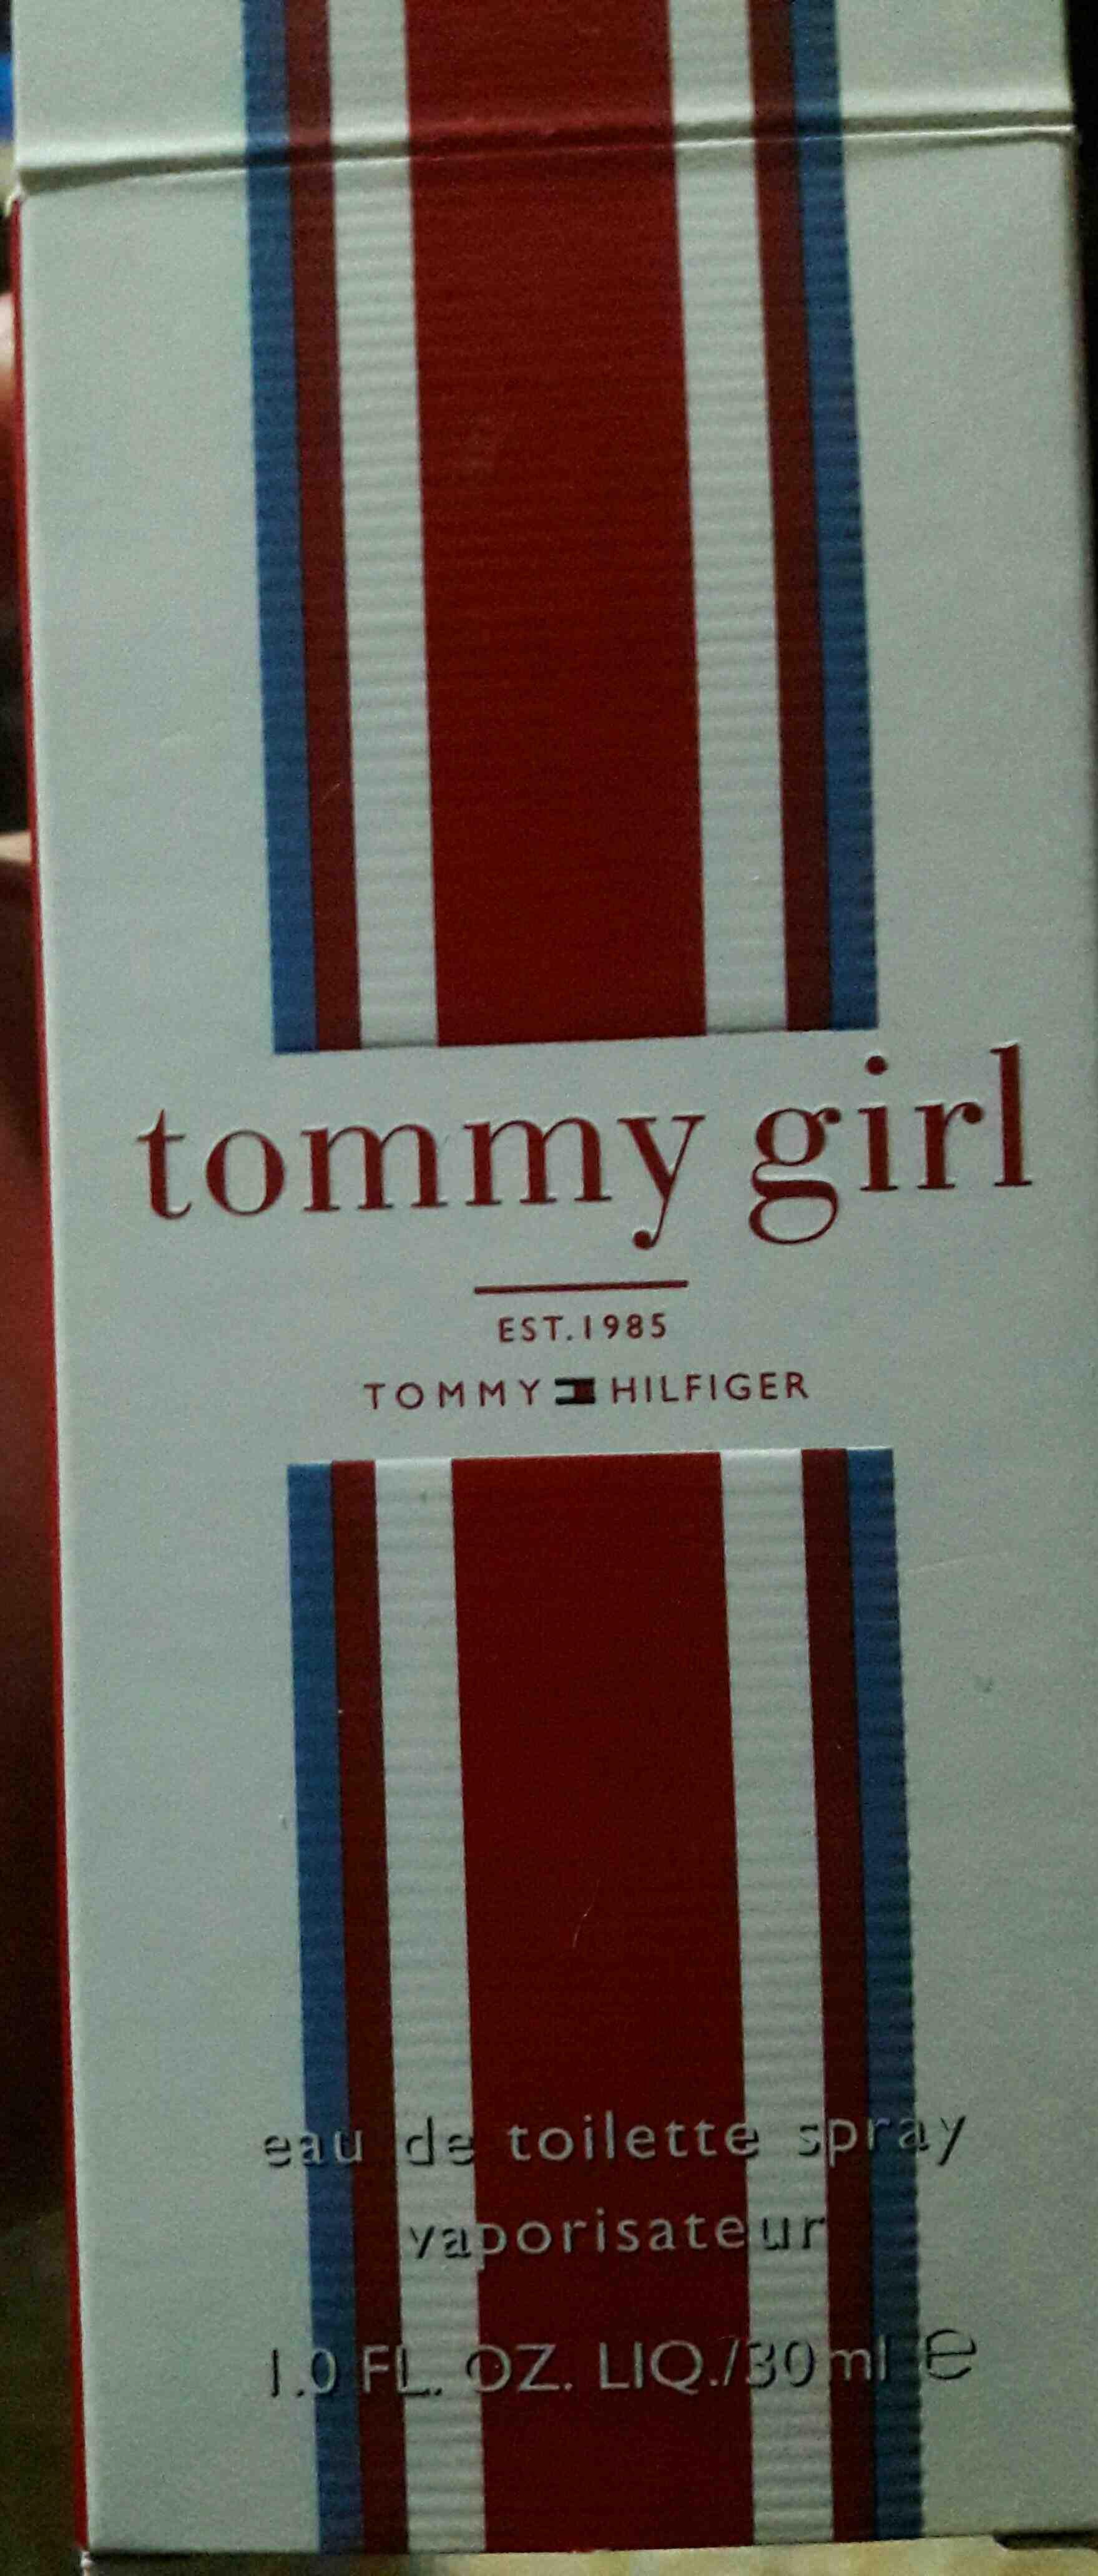 Tommy Girl - Product - en